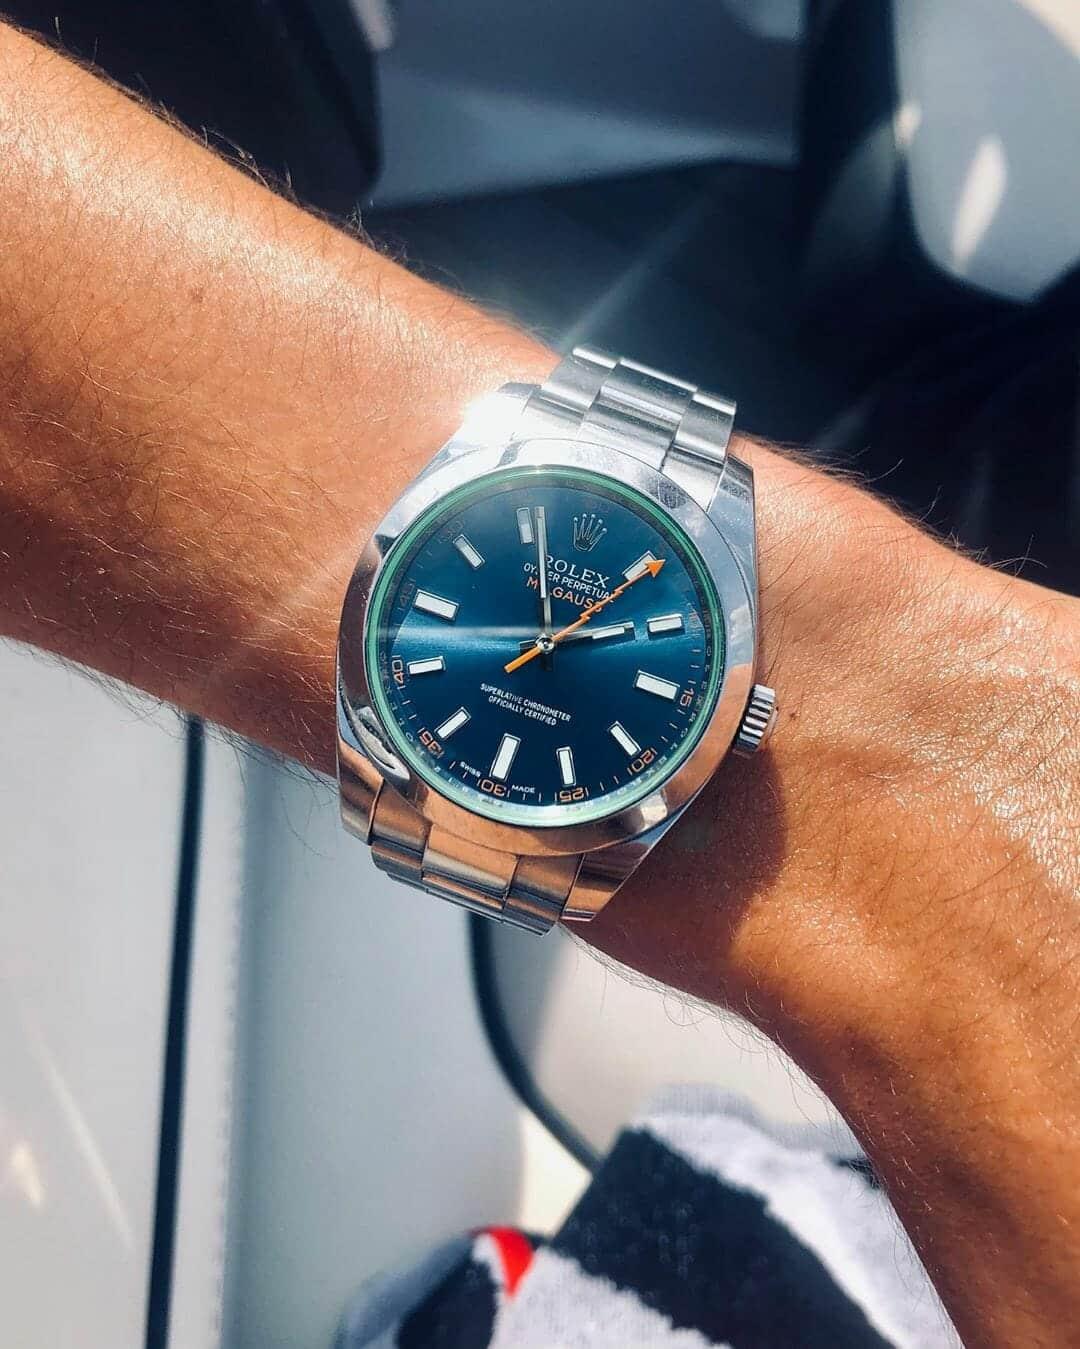 19 Rolex Milgauss by @watchrookiee - Image 1